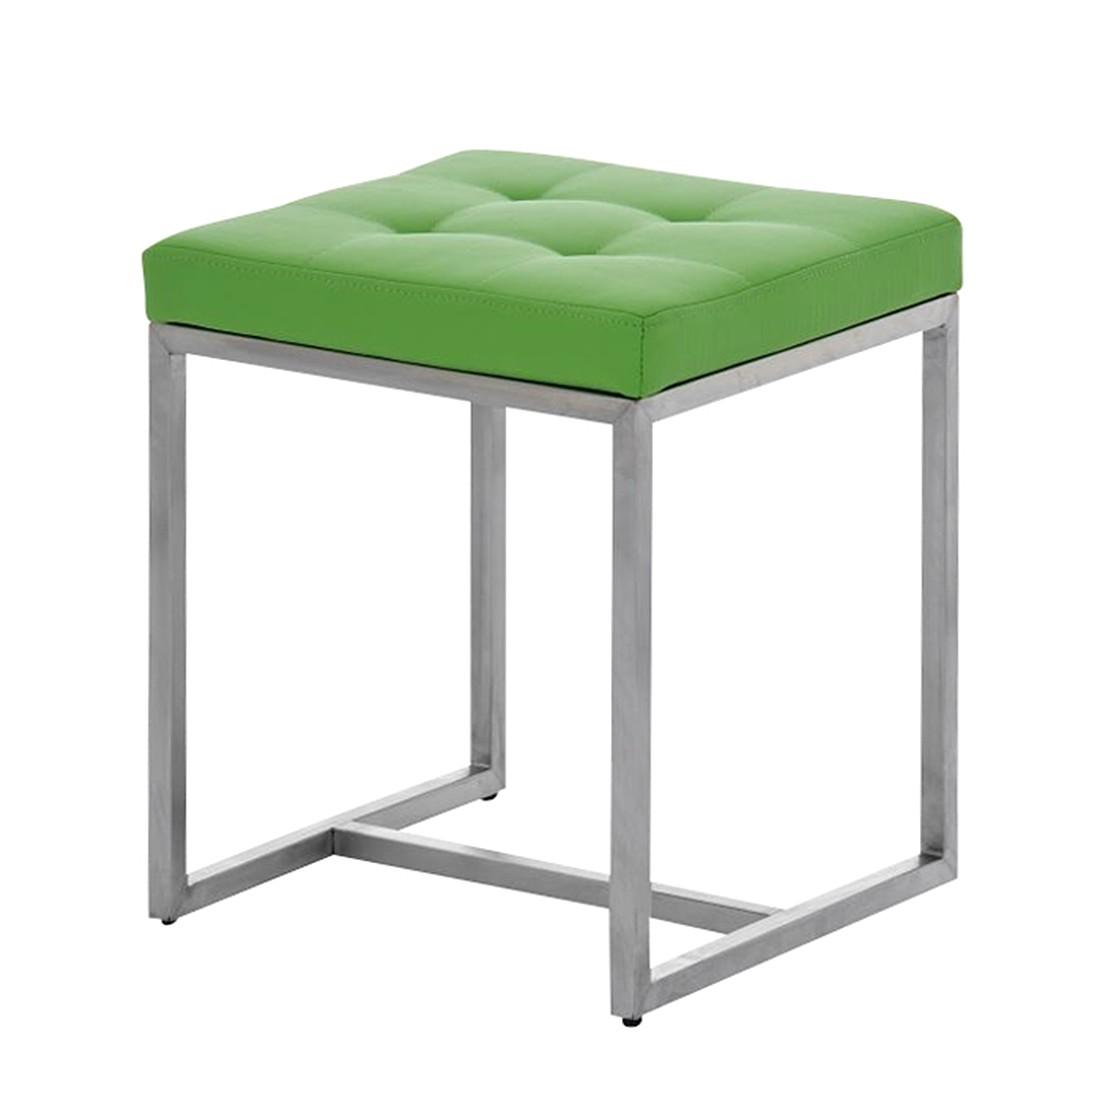 Sitzhocker Barci grün – Kunstleder/Edelstahl, CLP online bestellen